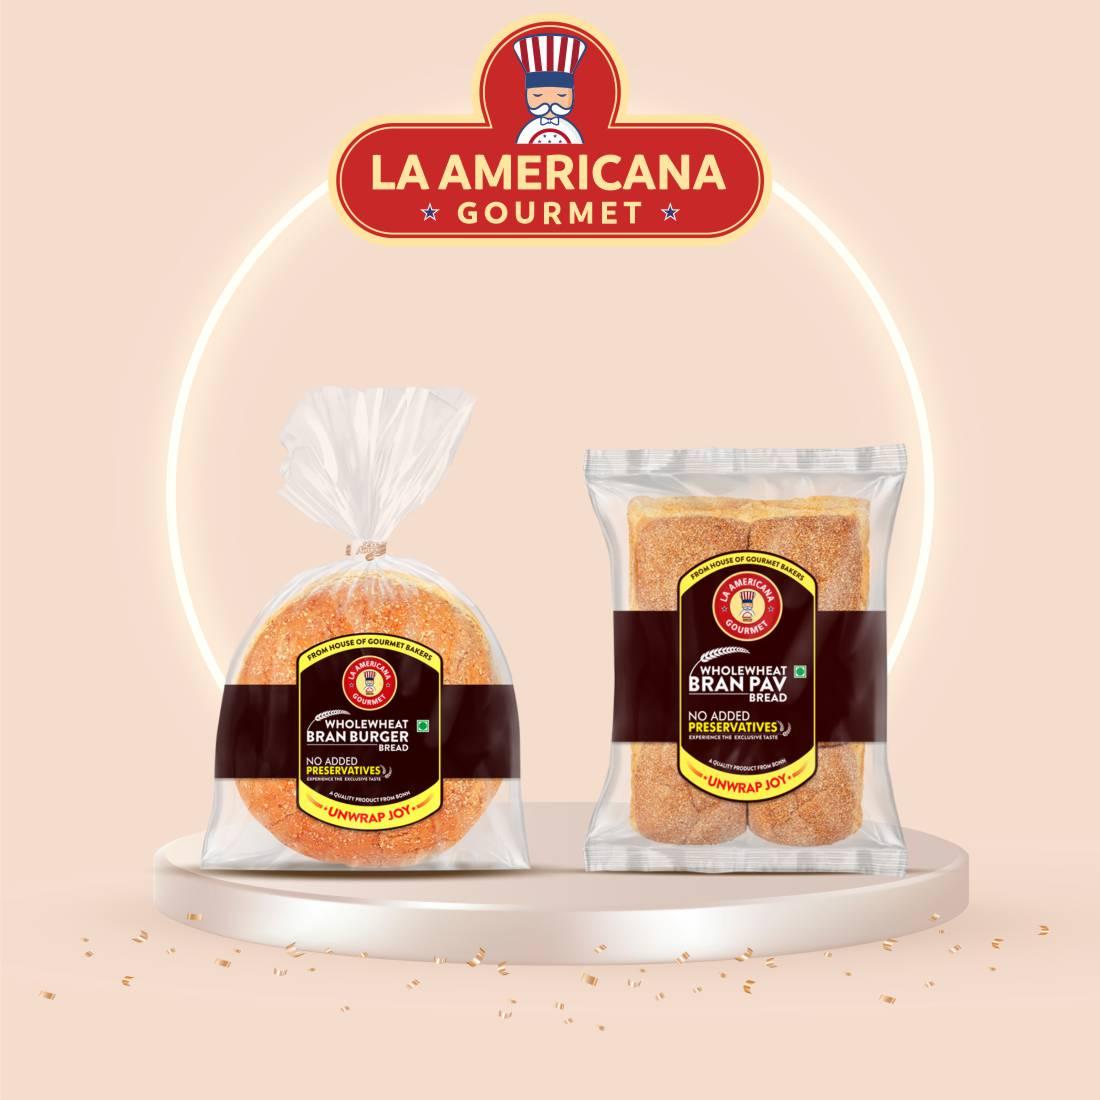 La Americana Wholewheat Bran Burger 150g, and La Americana Wholewheat Bran Pav Bread 250g, (Pack of 1 each)